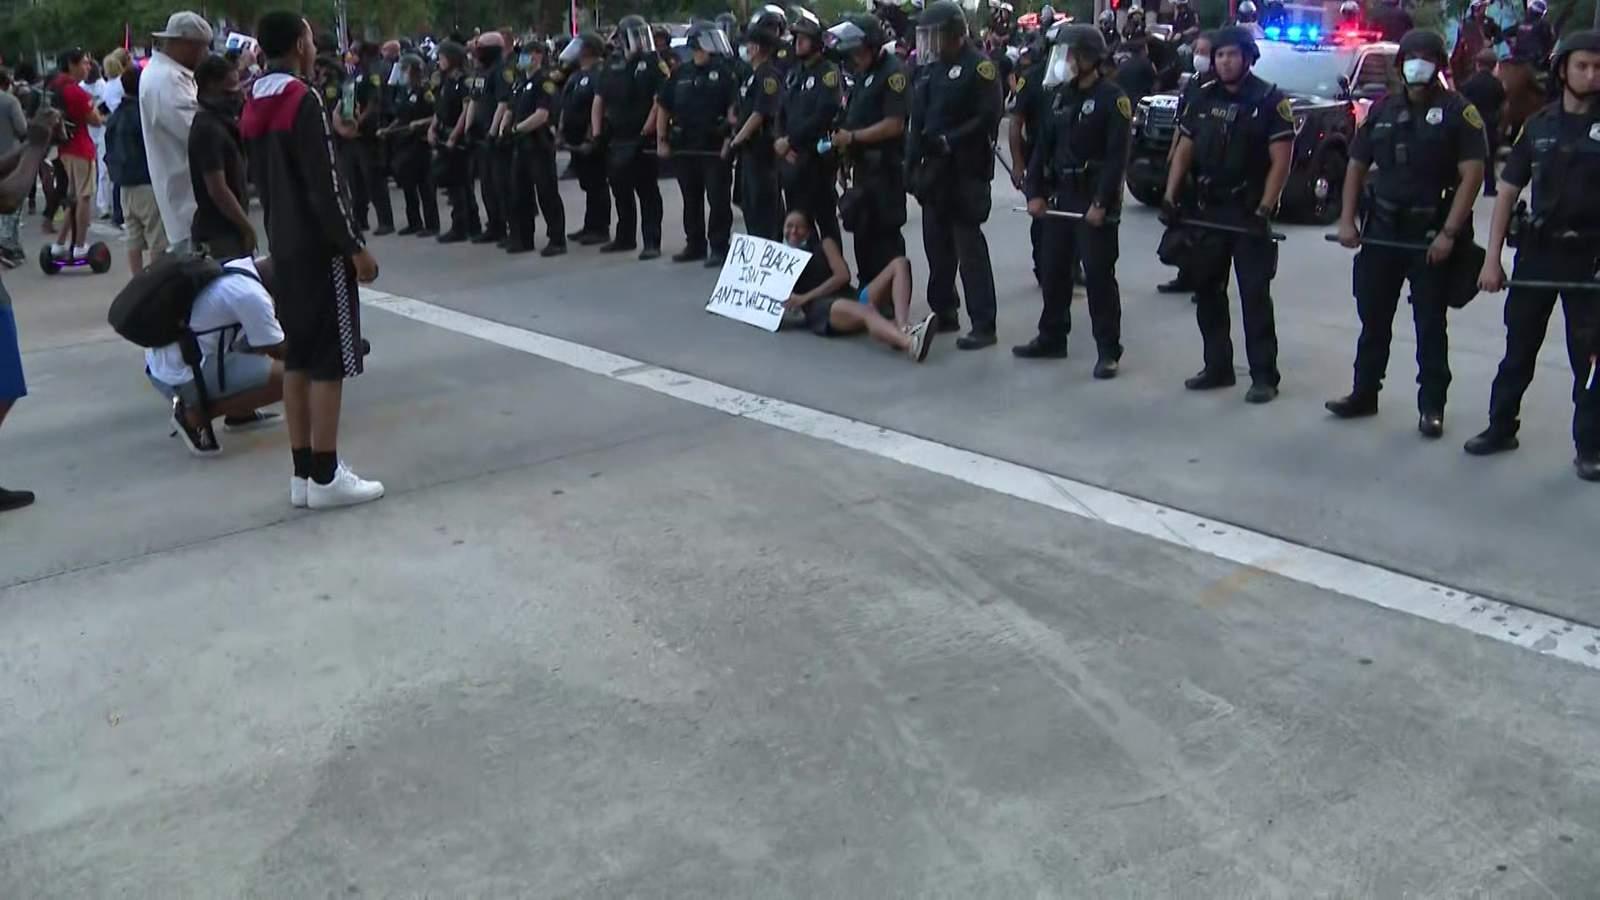 houston protest - photo #32